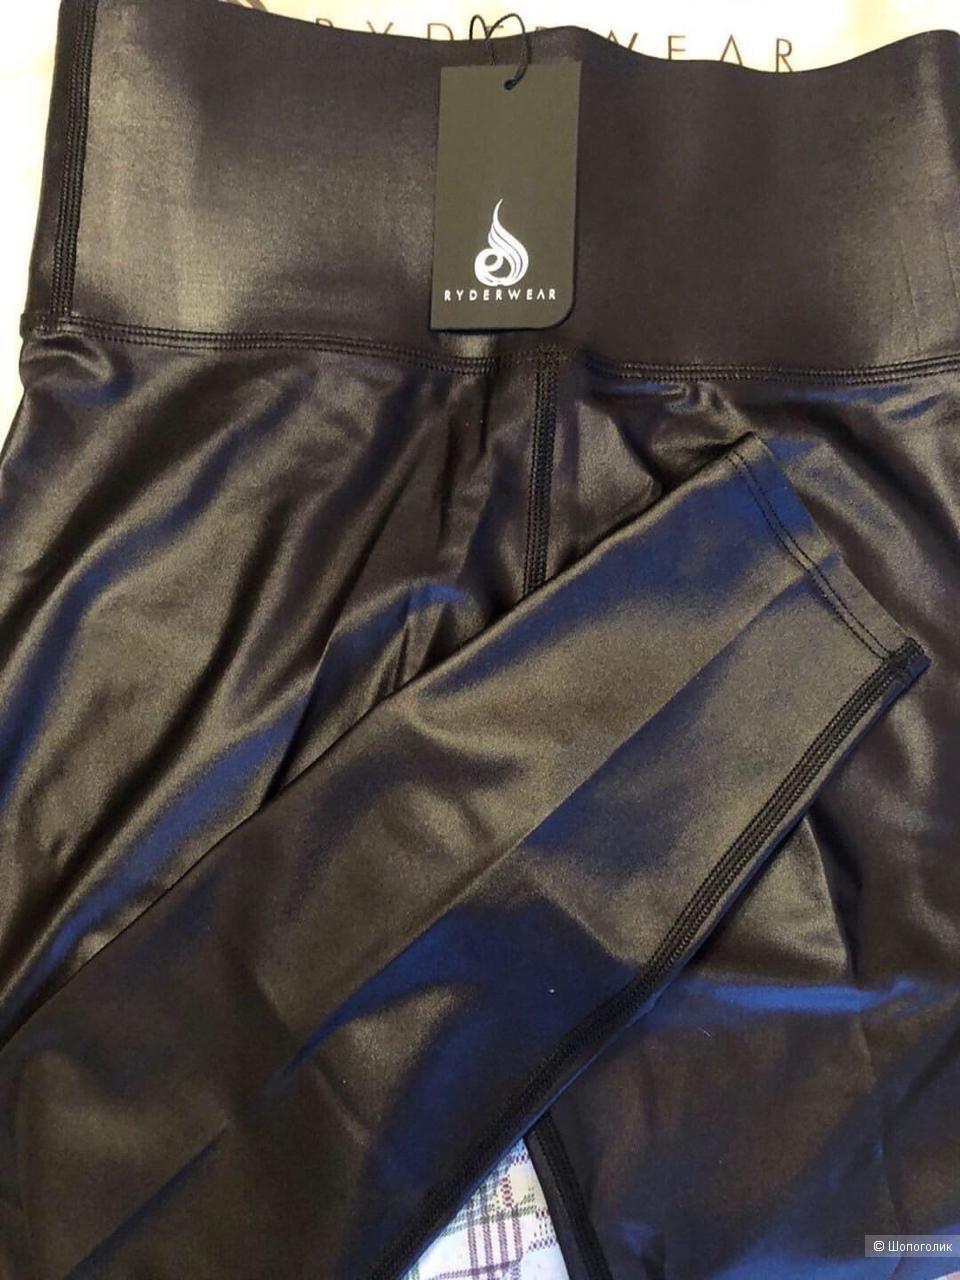 Леггинсы Ryderwear, размер L